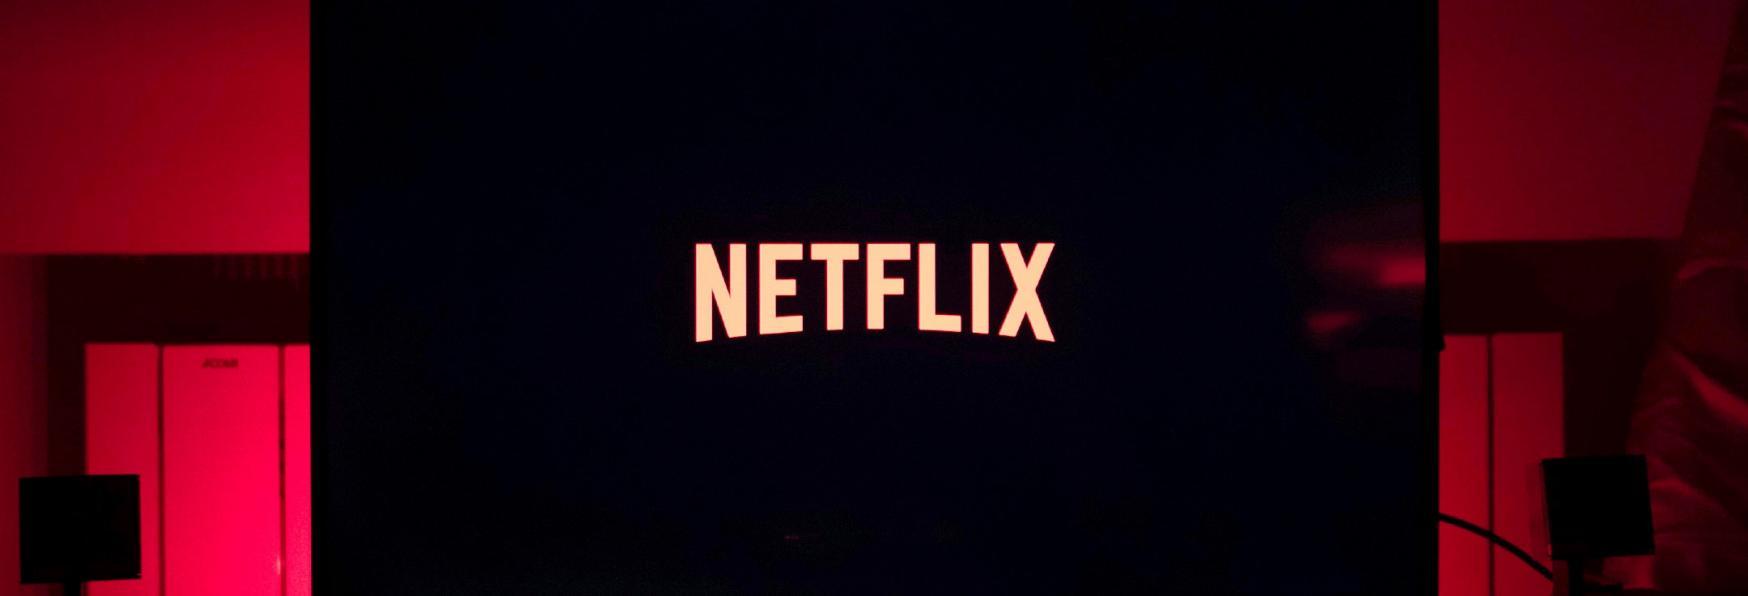 "La geniale Campagna #iorestoacasa proposta a Netflix: ""Se Esci riceverai Spoiler"""